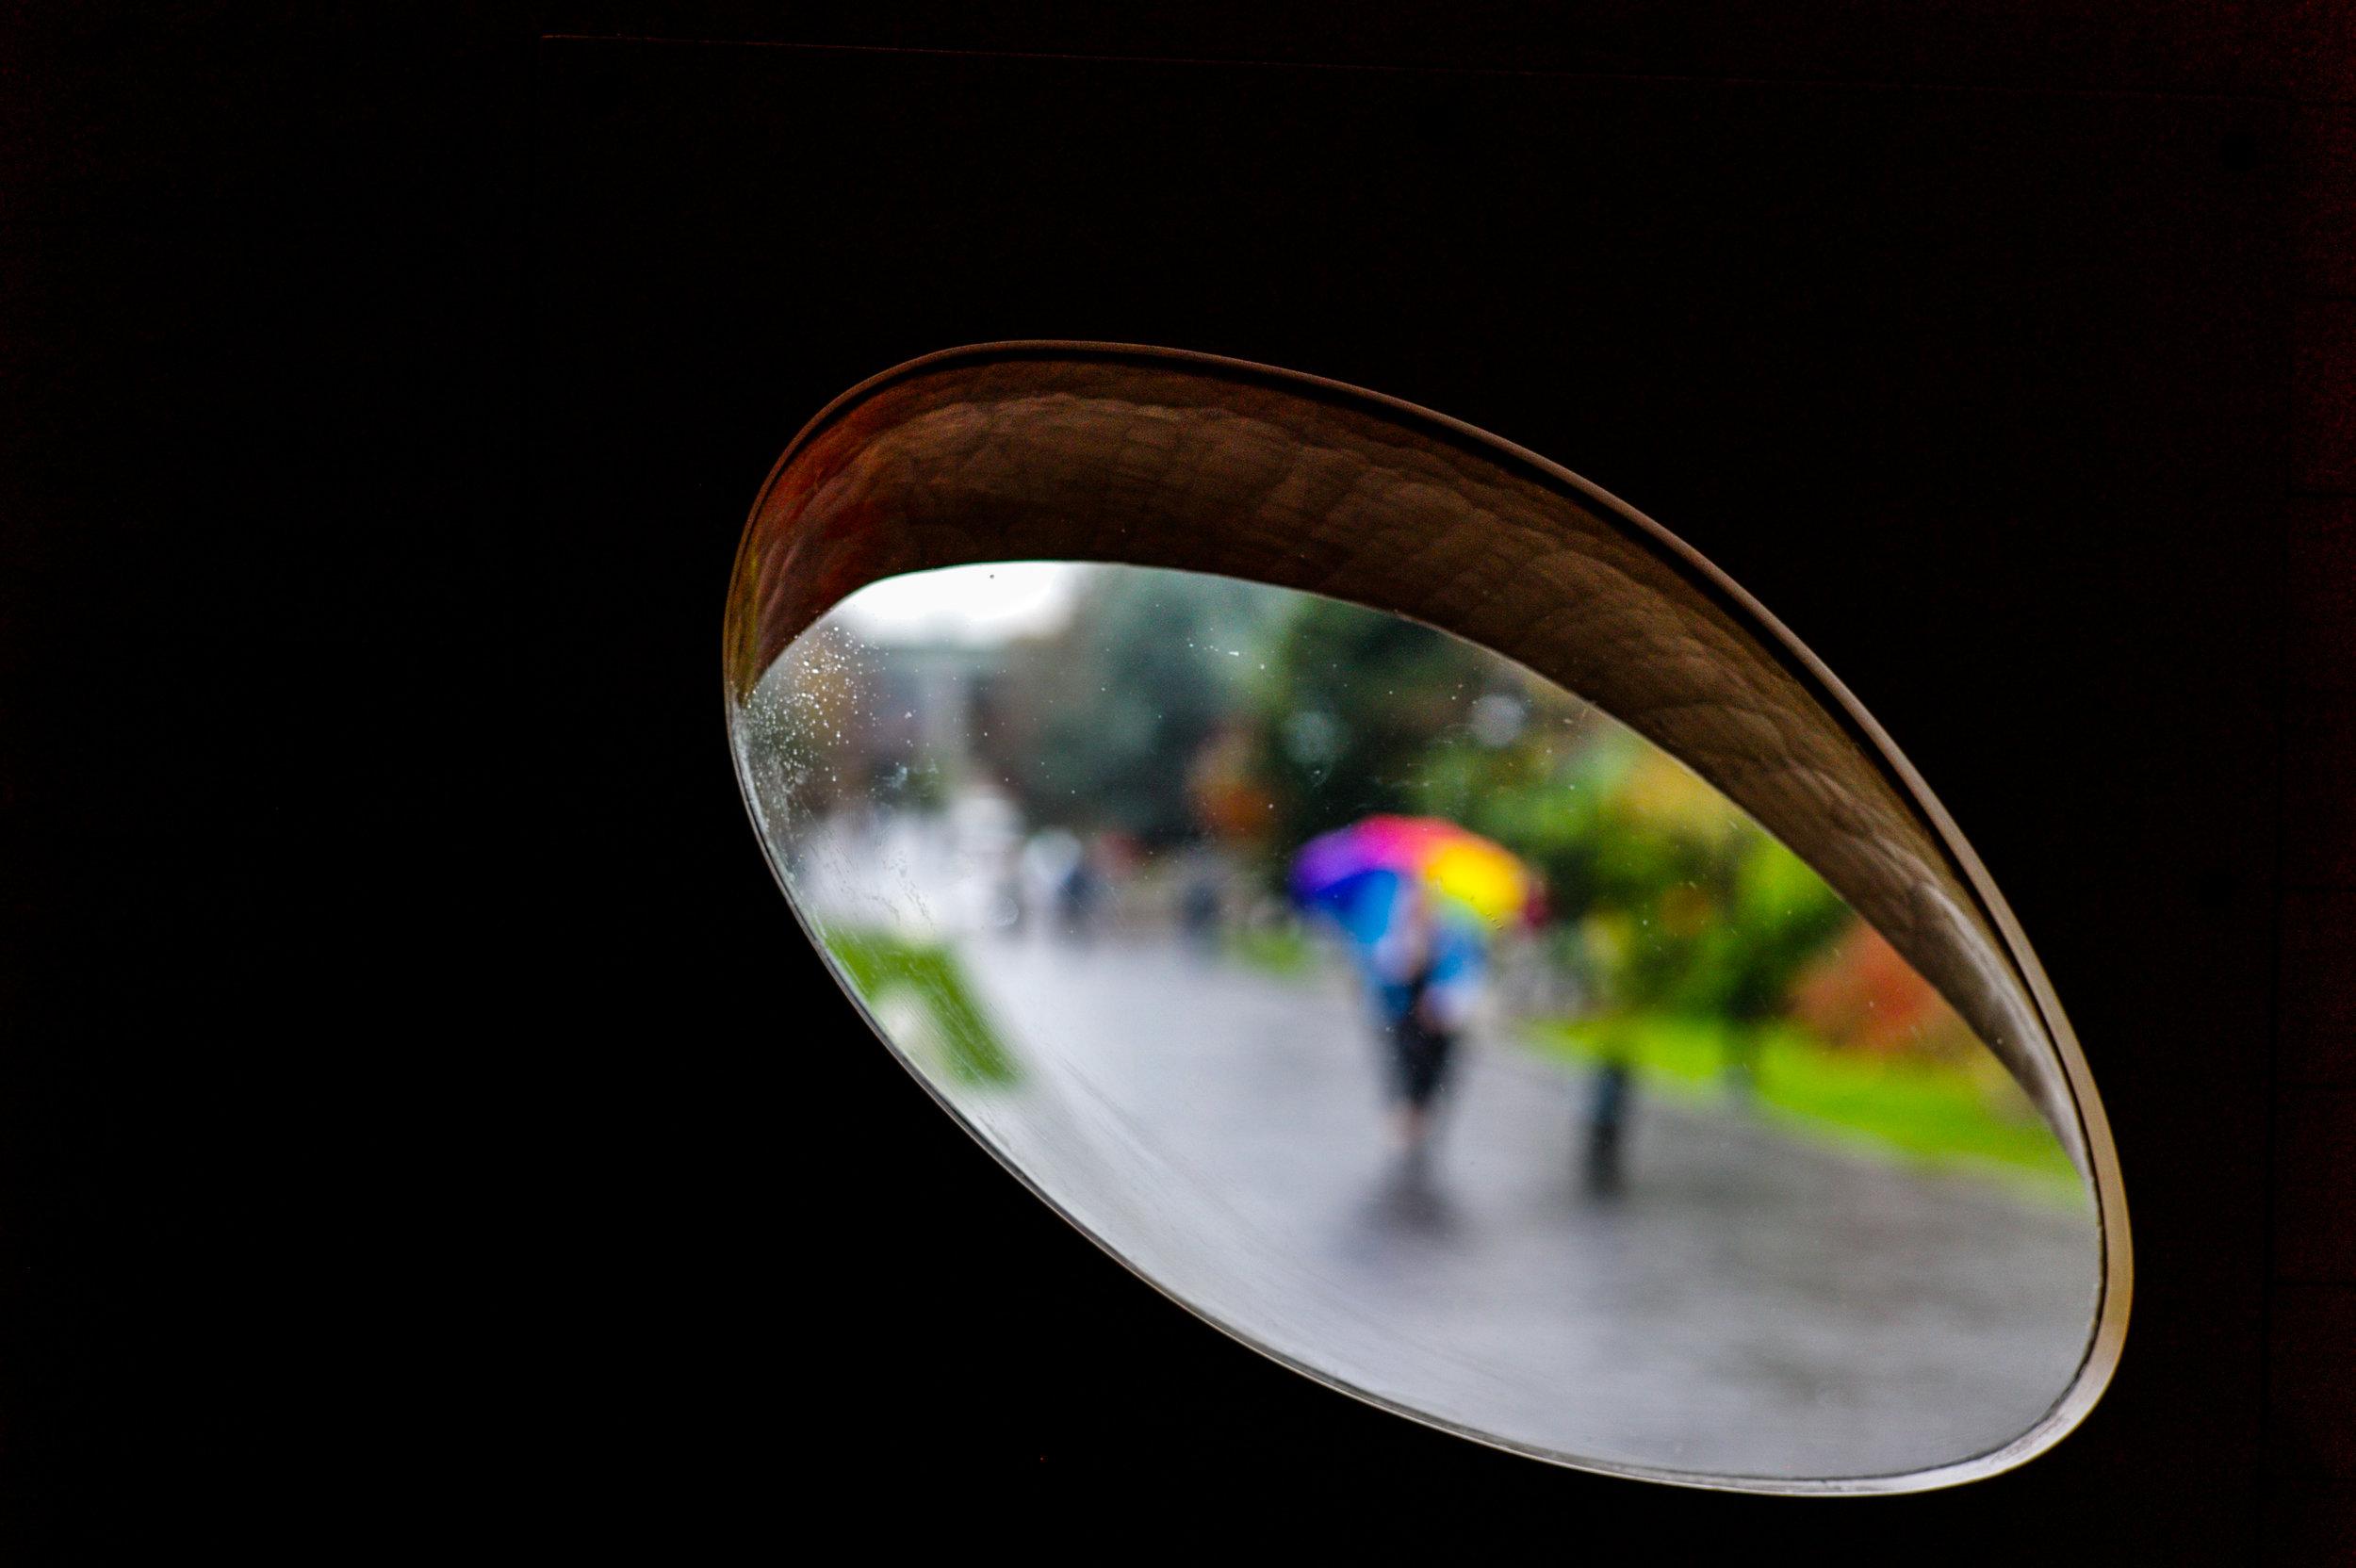 Through Steven Holl's Window